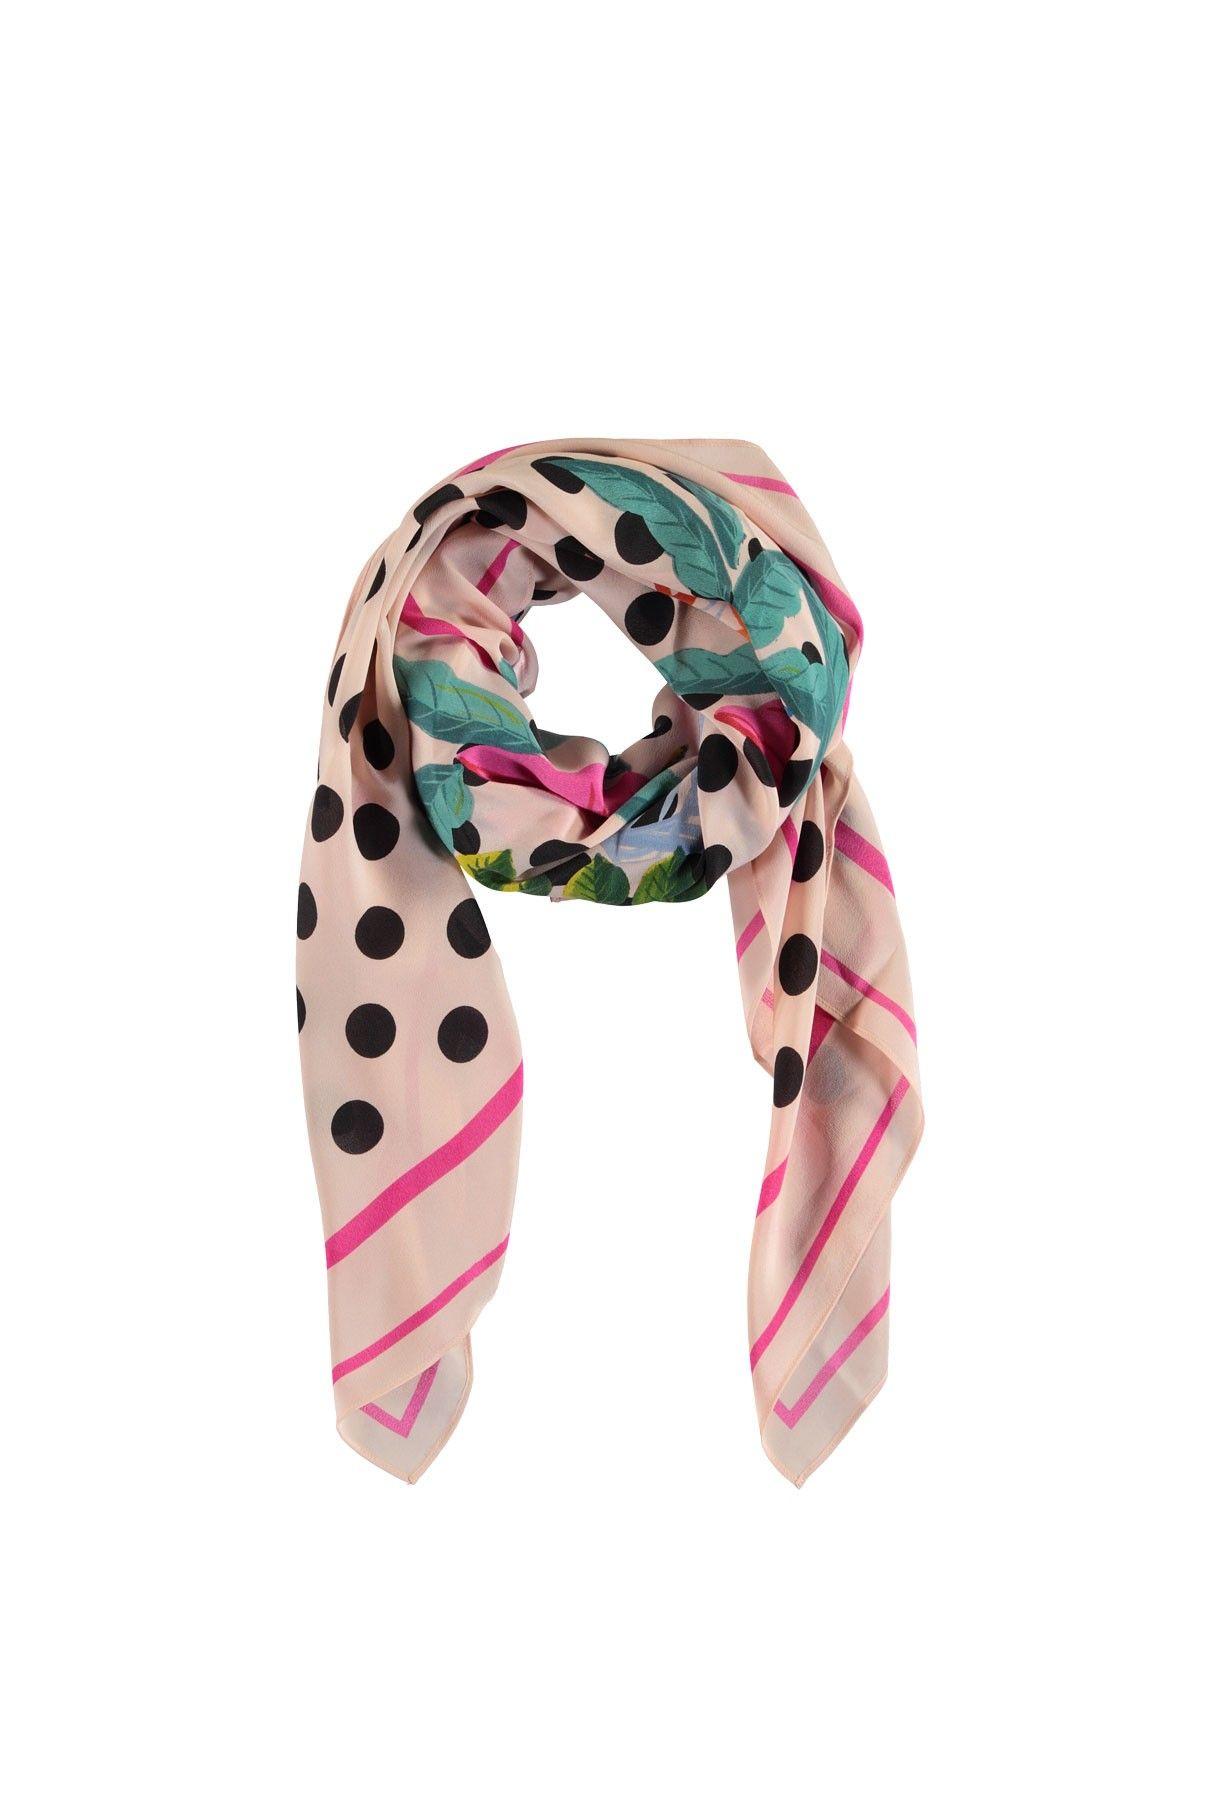 c141228bff0b4 Ontana scarf - Scarves & Co Women - Accessories - Essentiel Antwerp ...